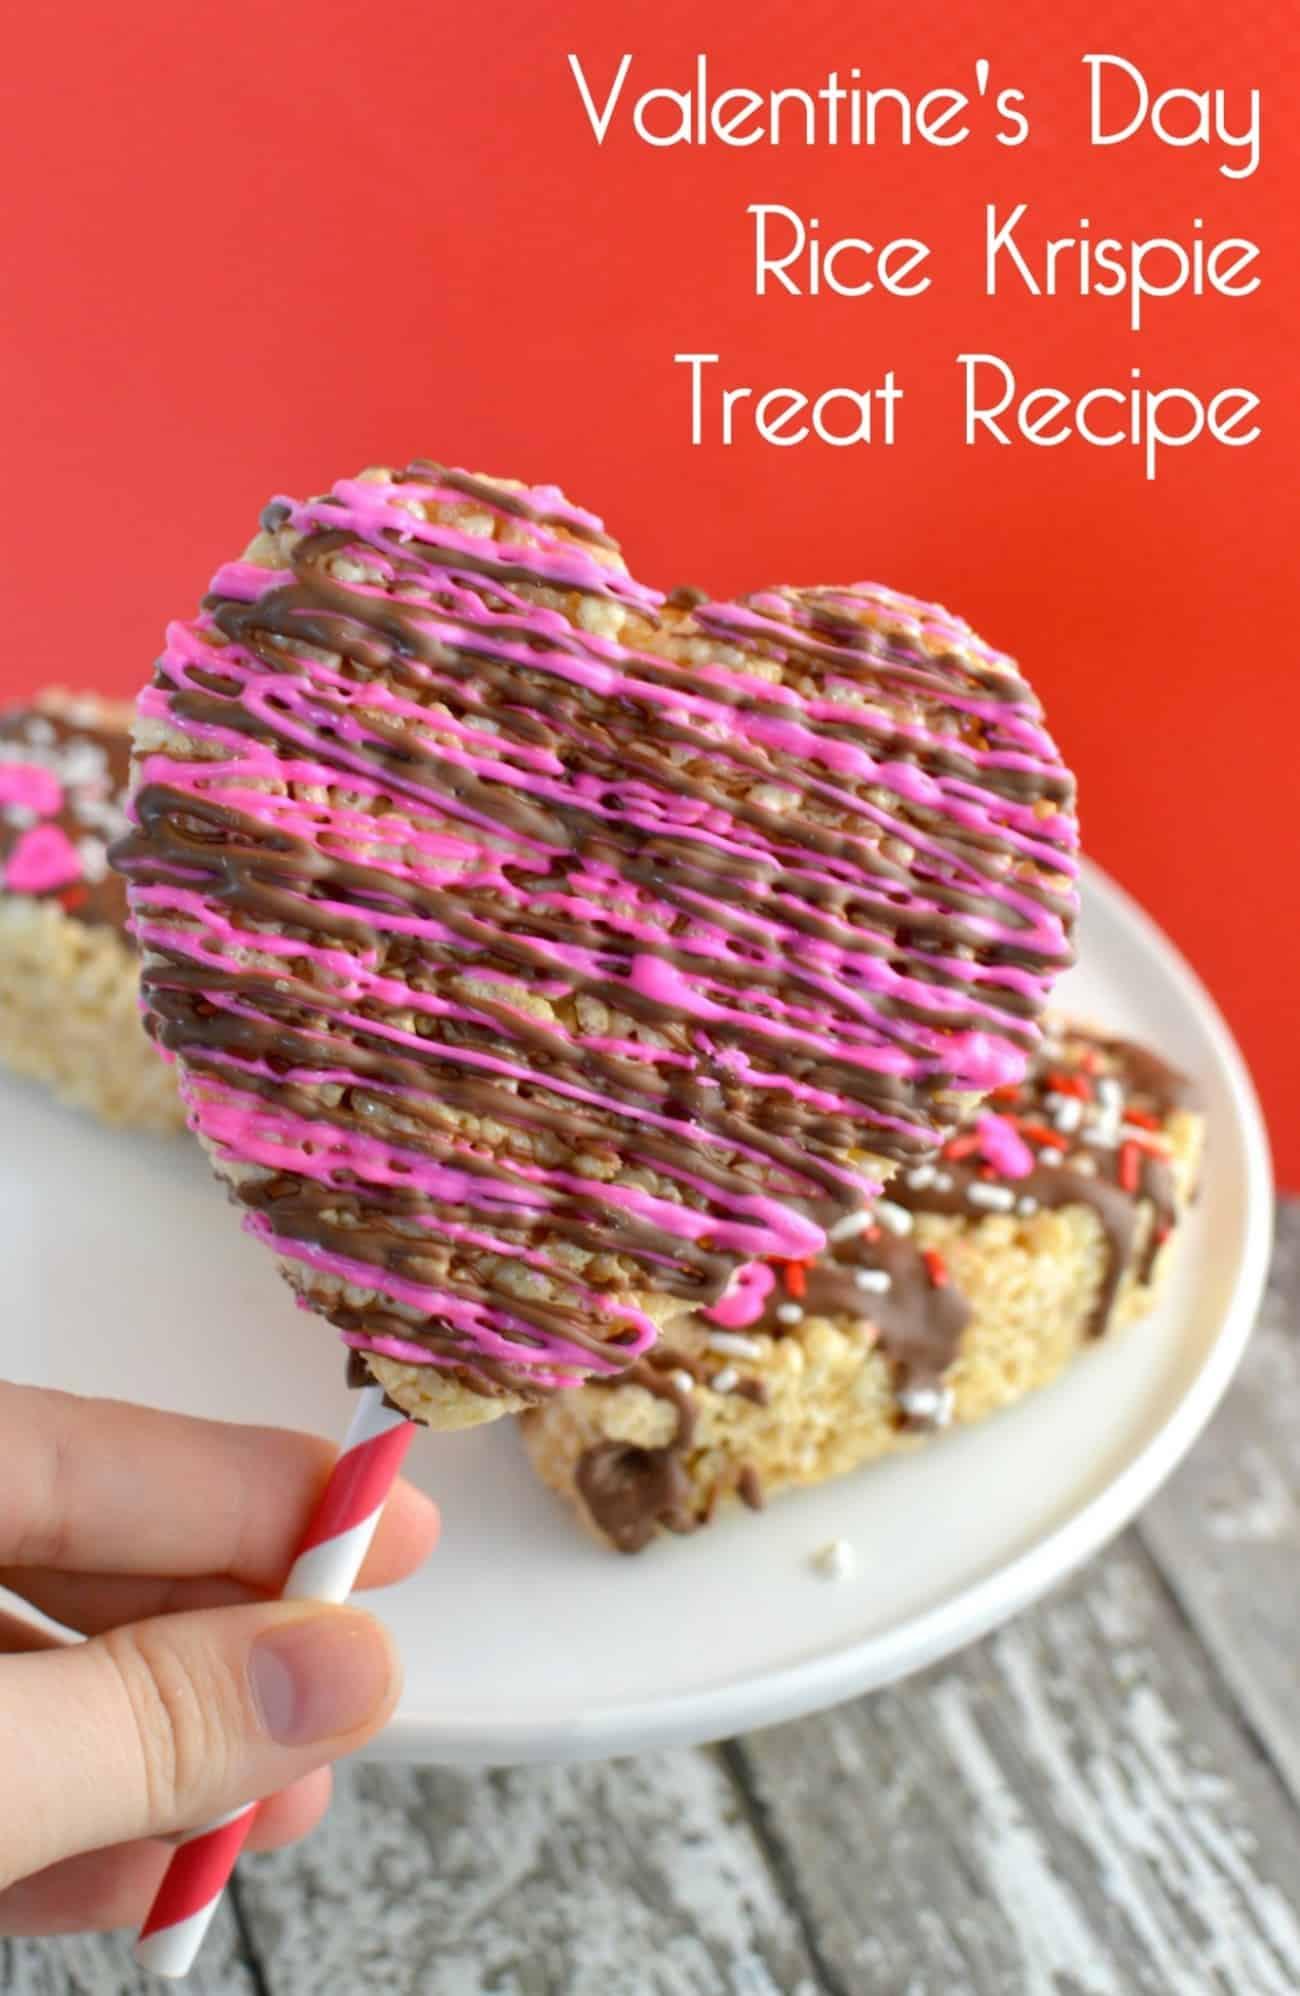 Valentine's Day Rice Krispie Treat Recipe - diycandy.com